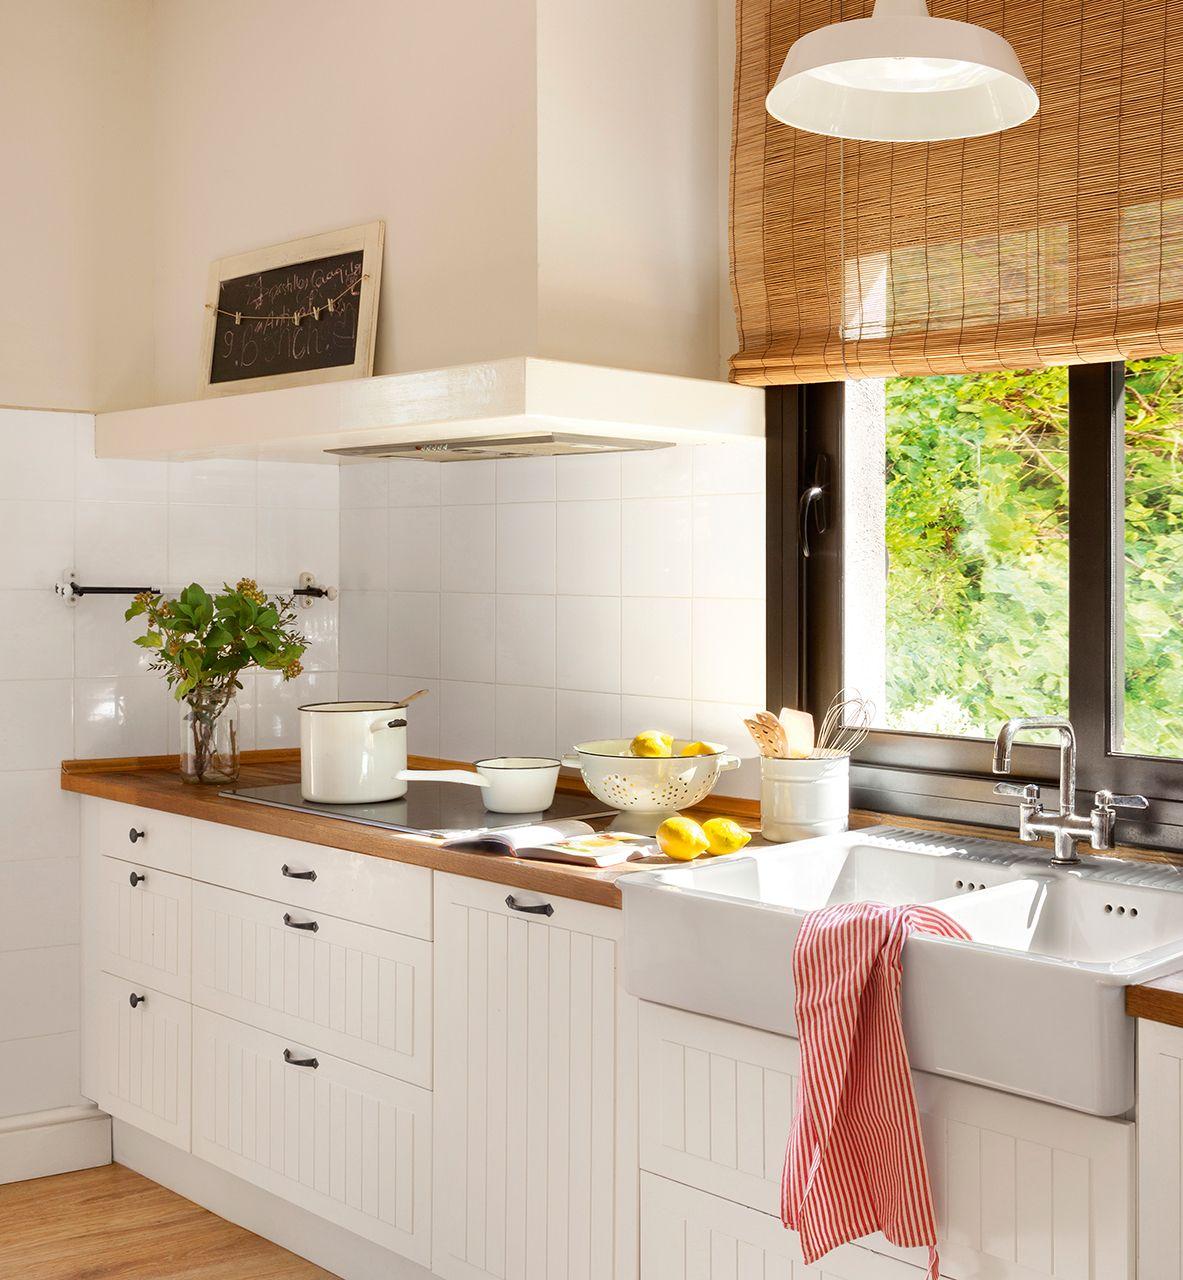 Ideas de decoraci n para cocinas peque as decoraciones - Ideas para cocinas pequenas ...